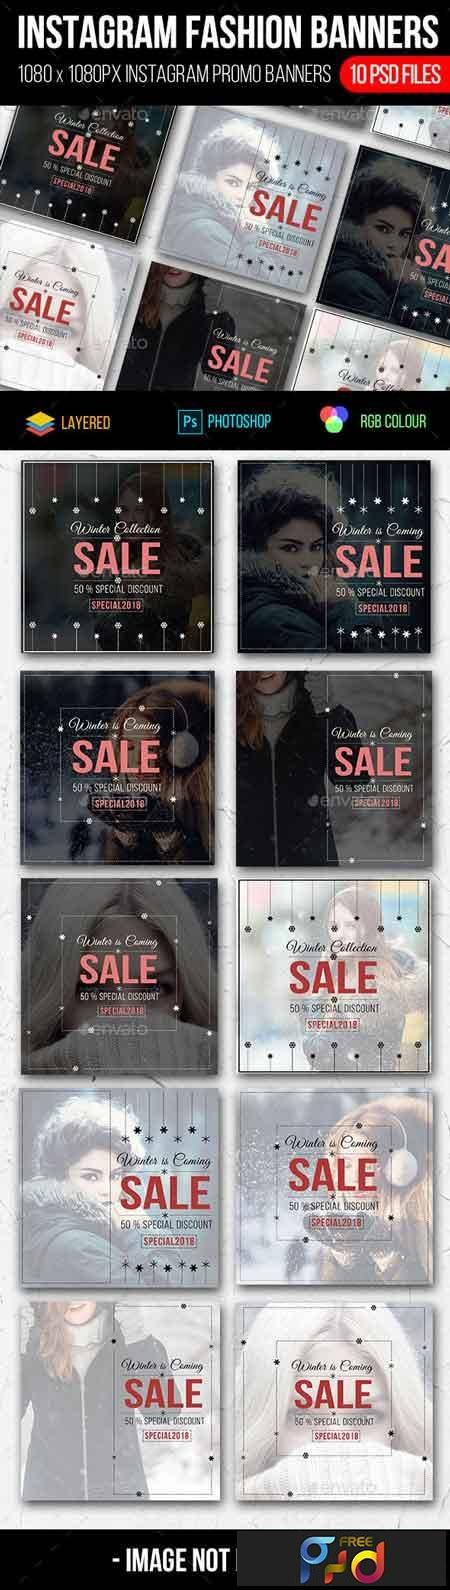 Instagram Fashion Sale Banners 22795262 1